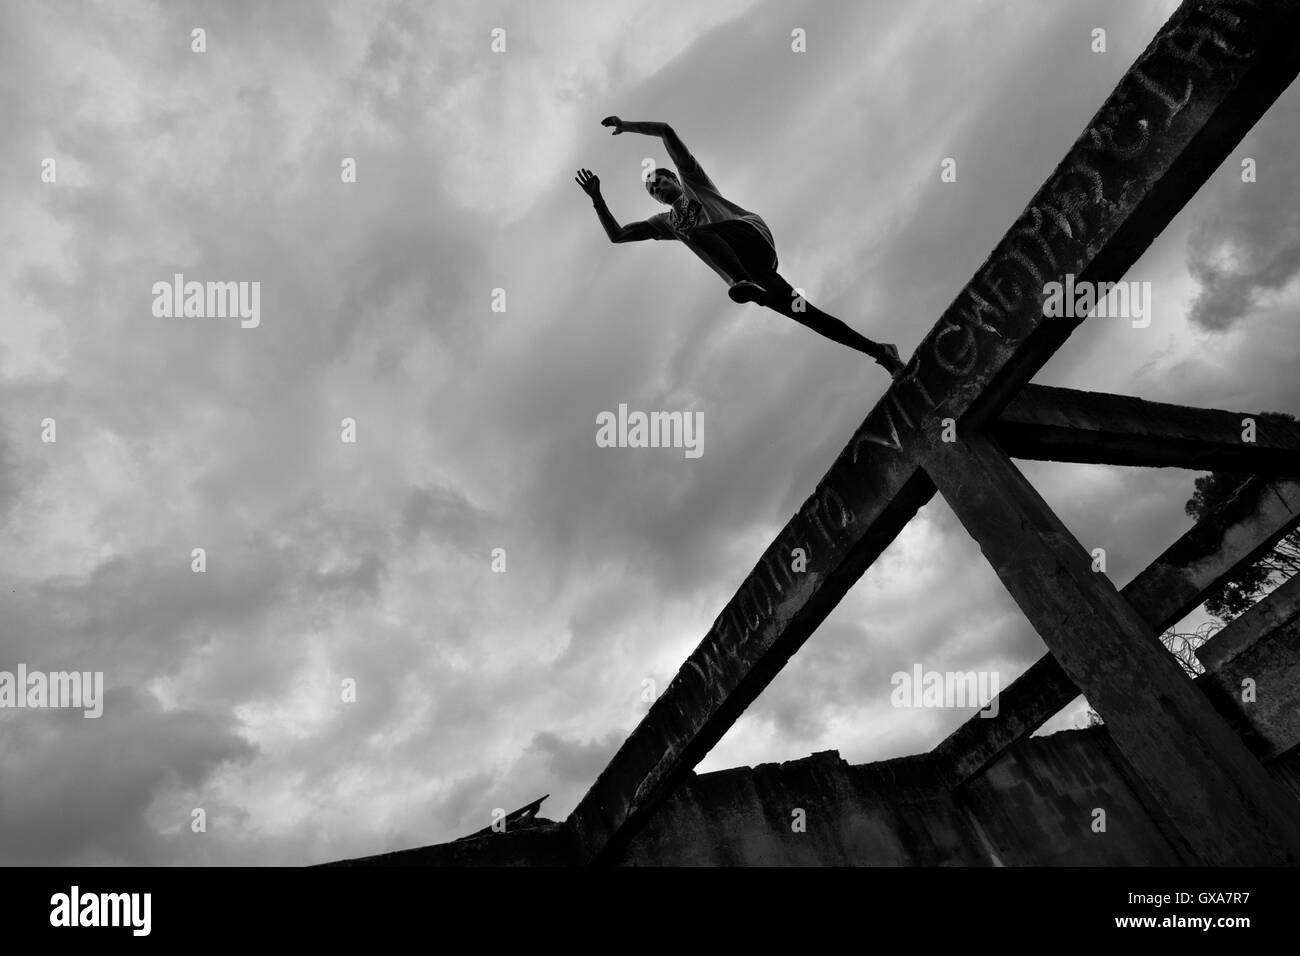 José Rodríguez, un freerunner de Plus equipo de Parkour, saltos desde la parte superior de las paredes Imagen De Stock